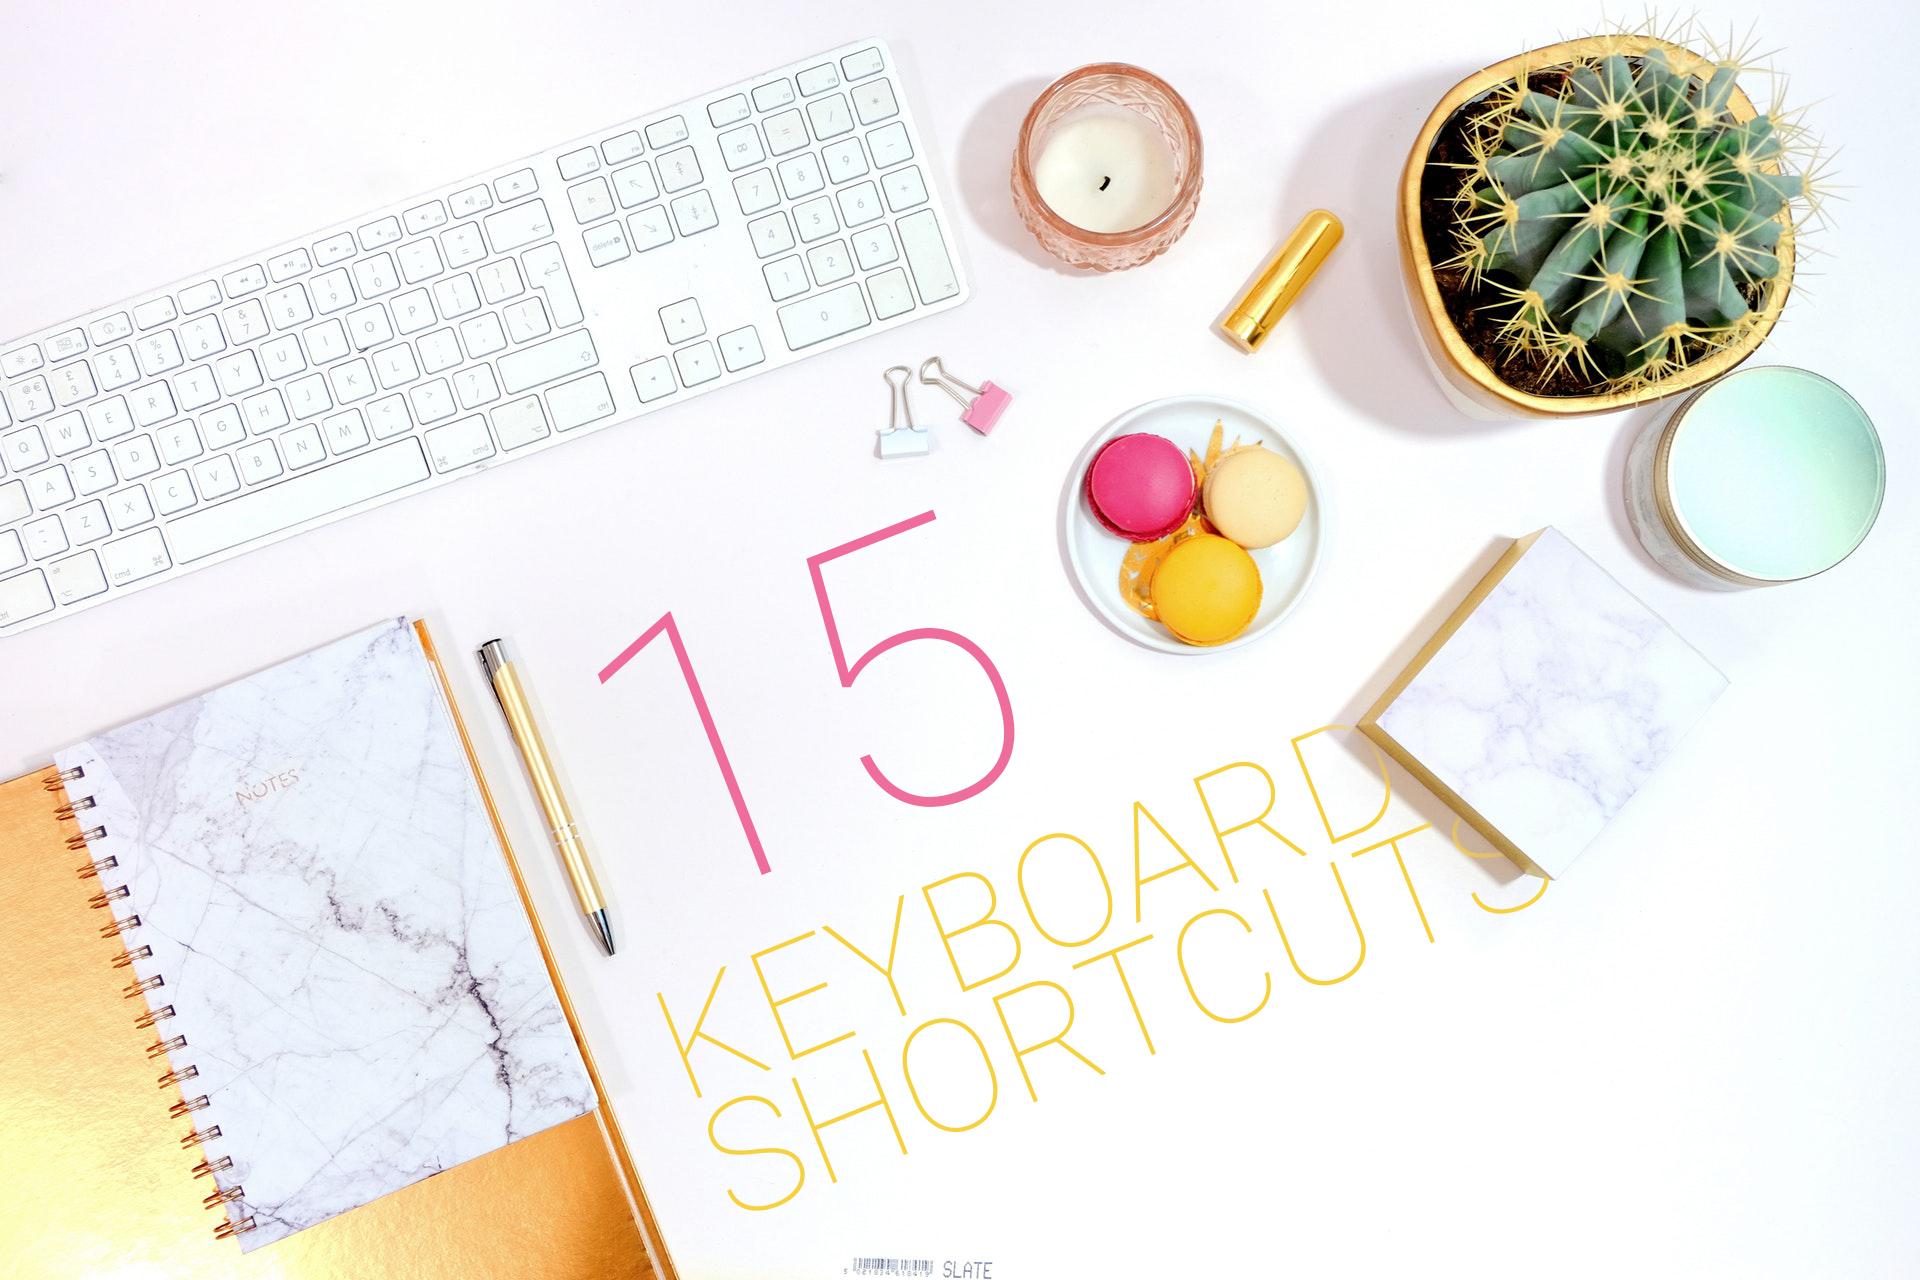 15 Keyboard Shortcuts Making Lives Easy